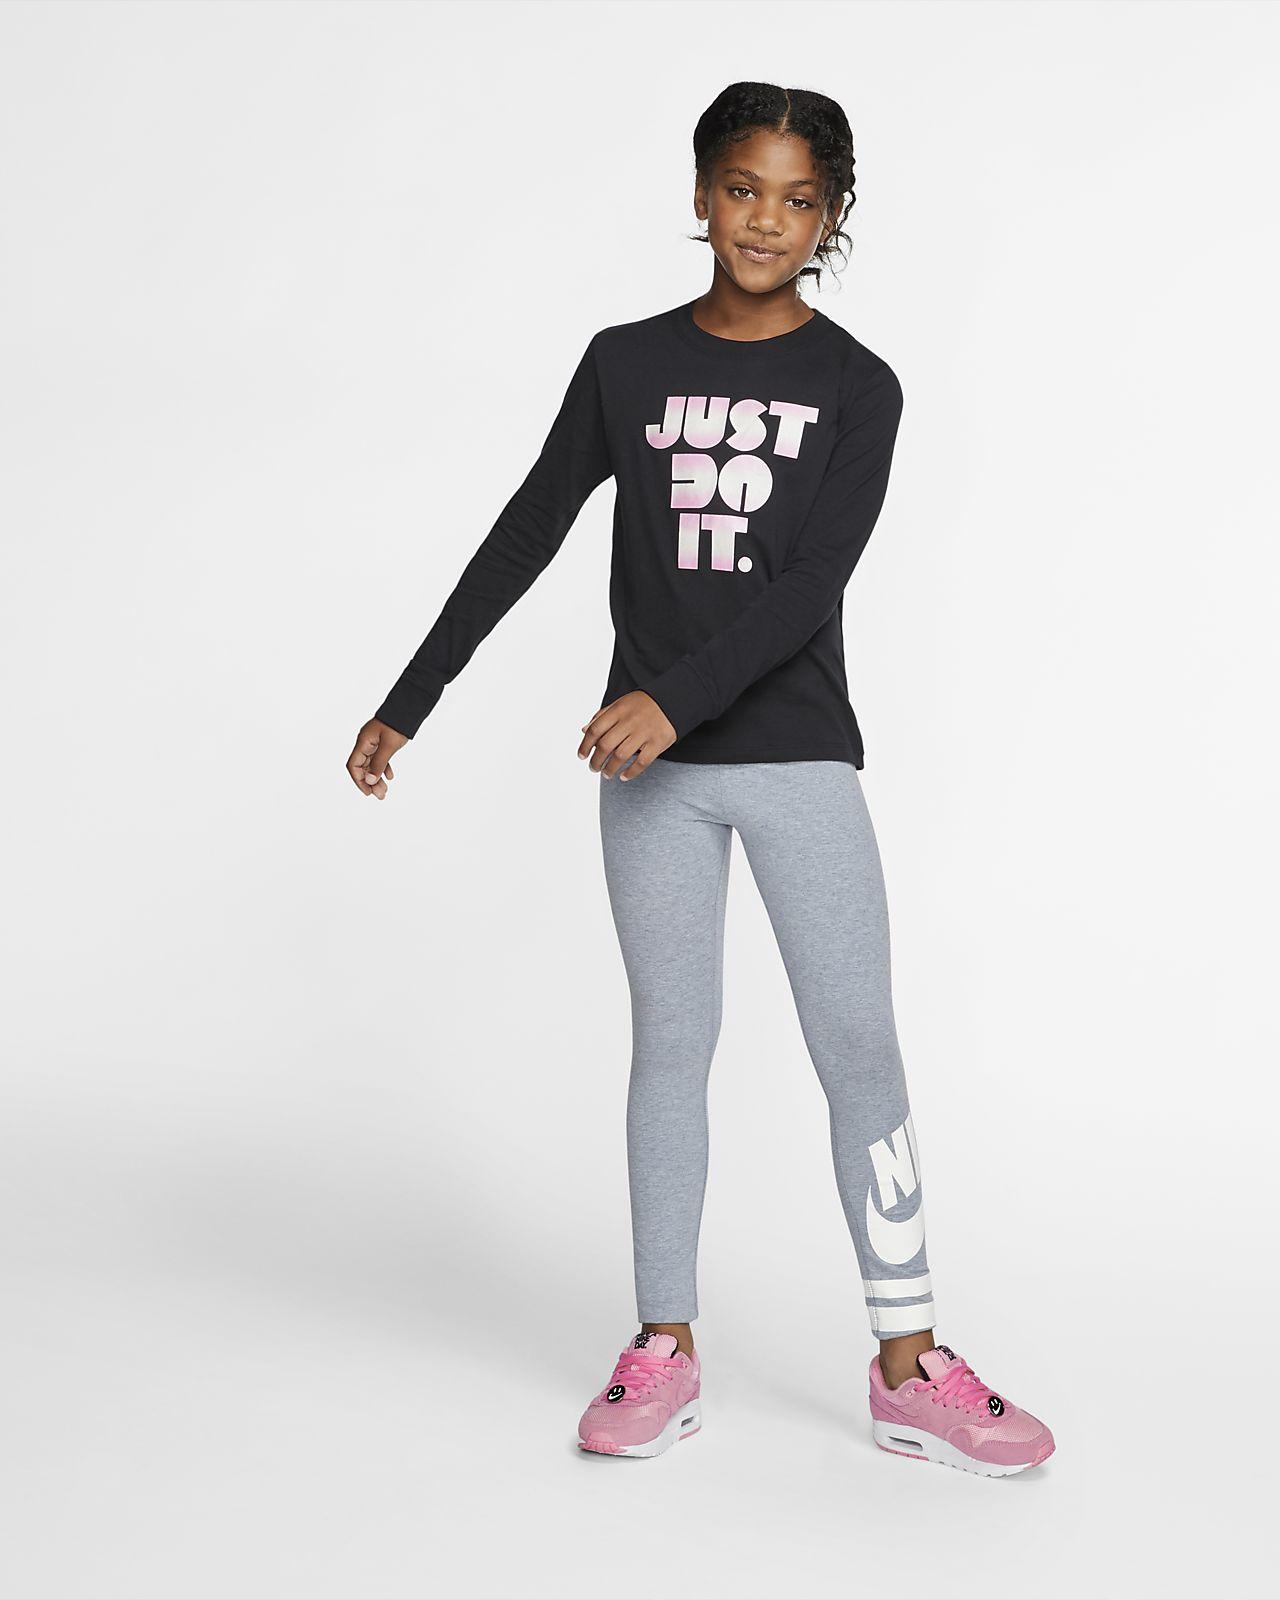 ee6dc7f4 Nike Sportswear Big Kids' Long-Sleeve JDI T-Shirt. Nike.com